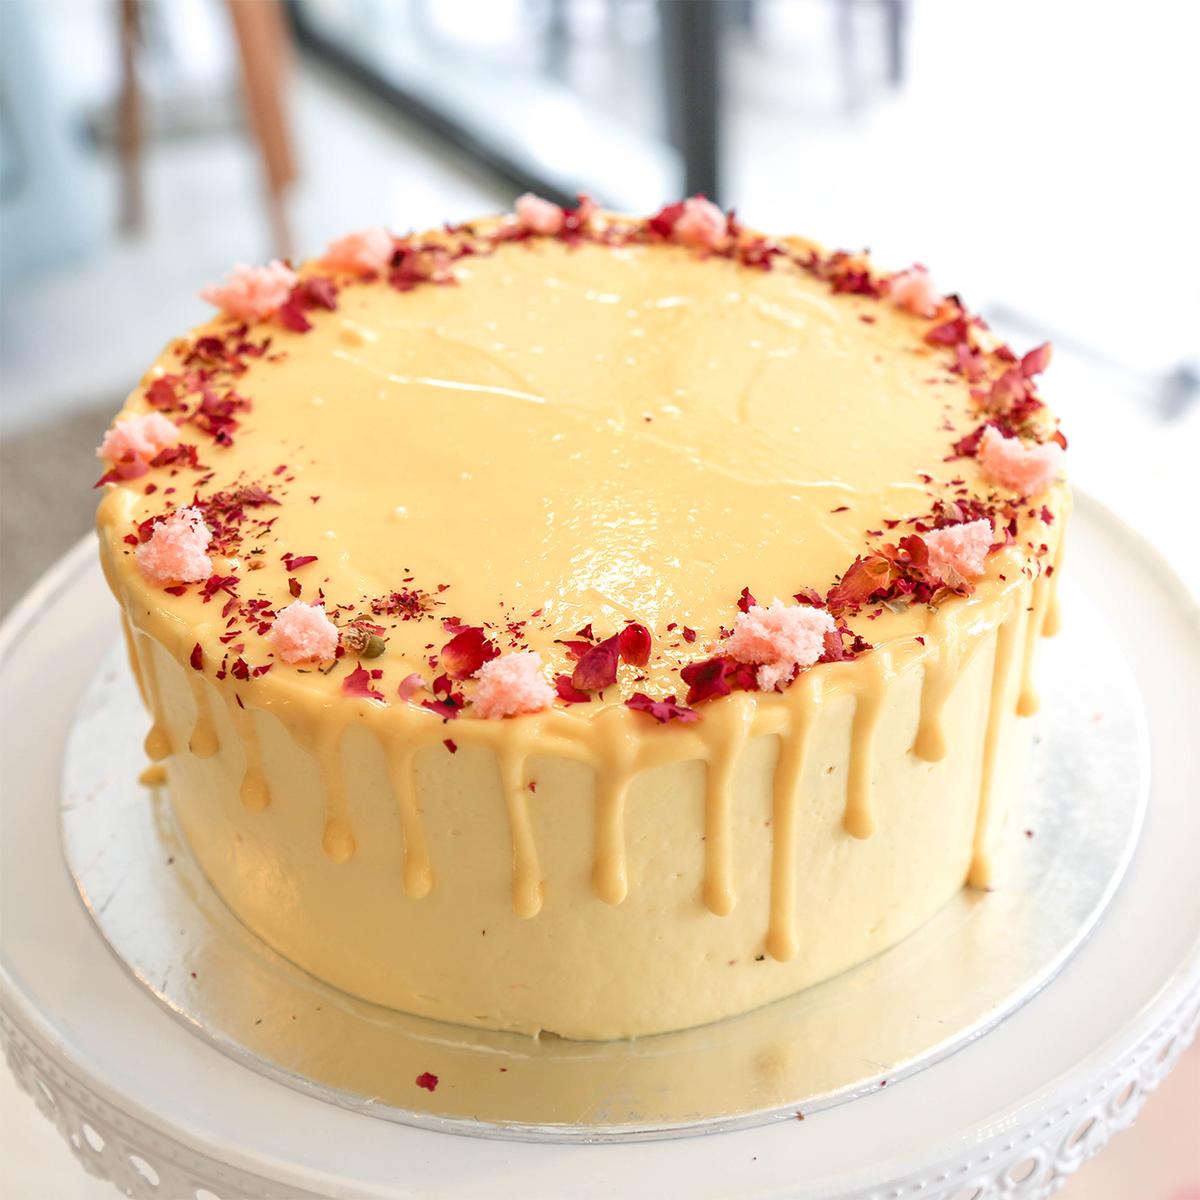 Lychee Sponge Cake